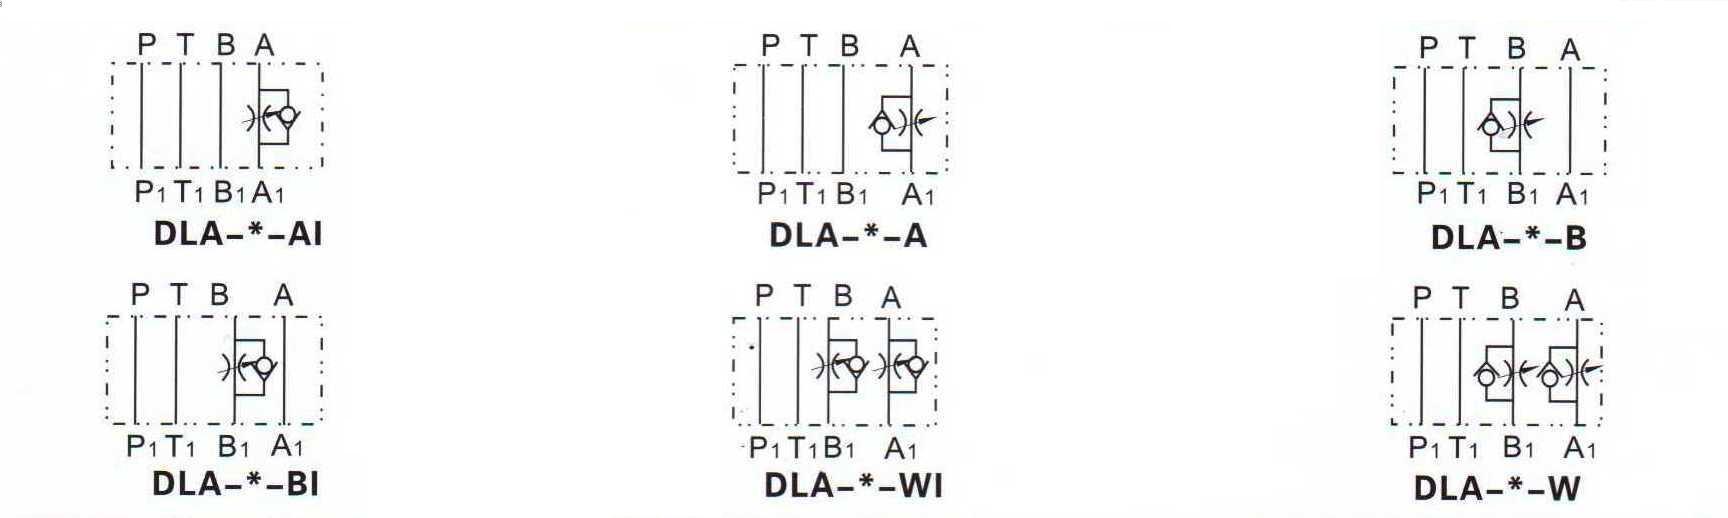 Code_symbol DL